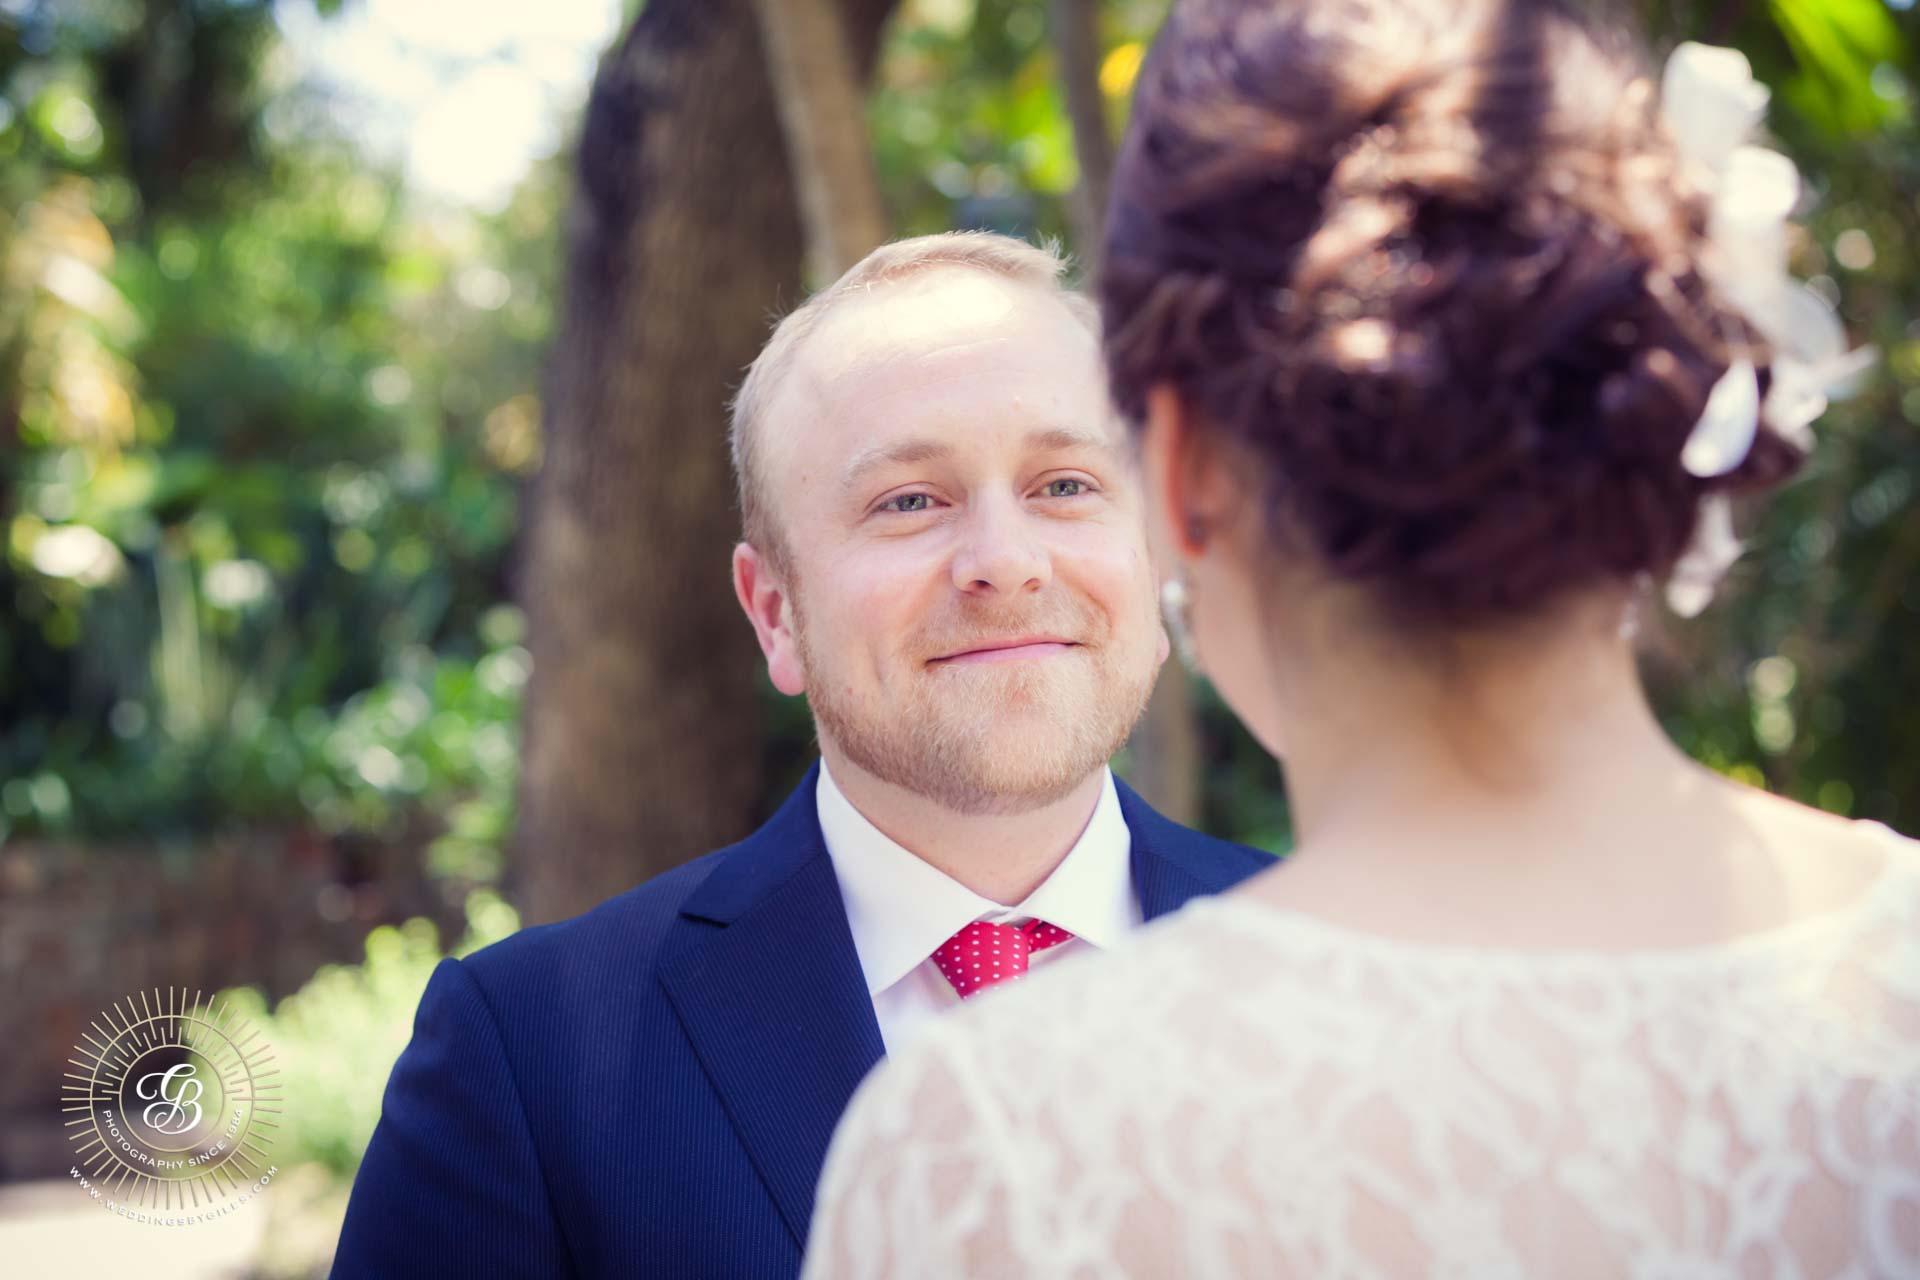 Groom looks at bride